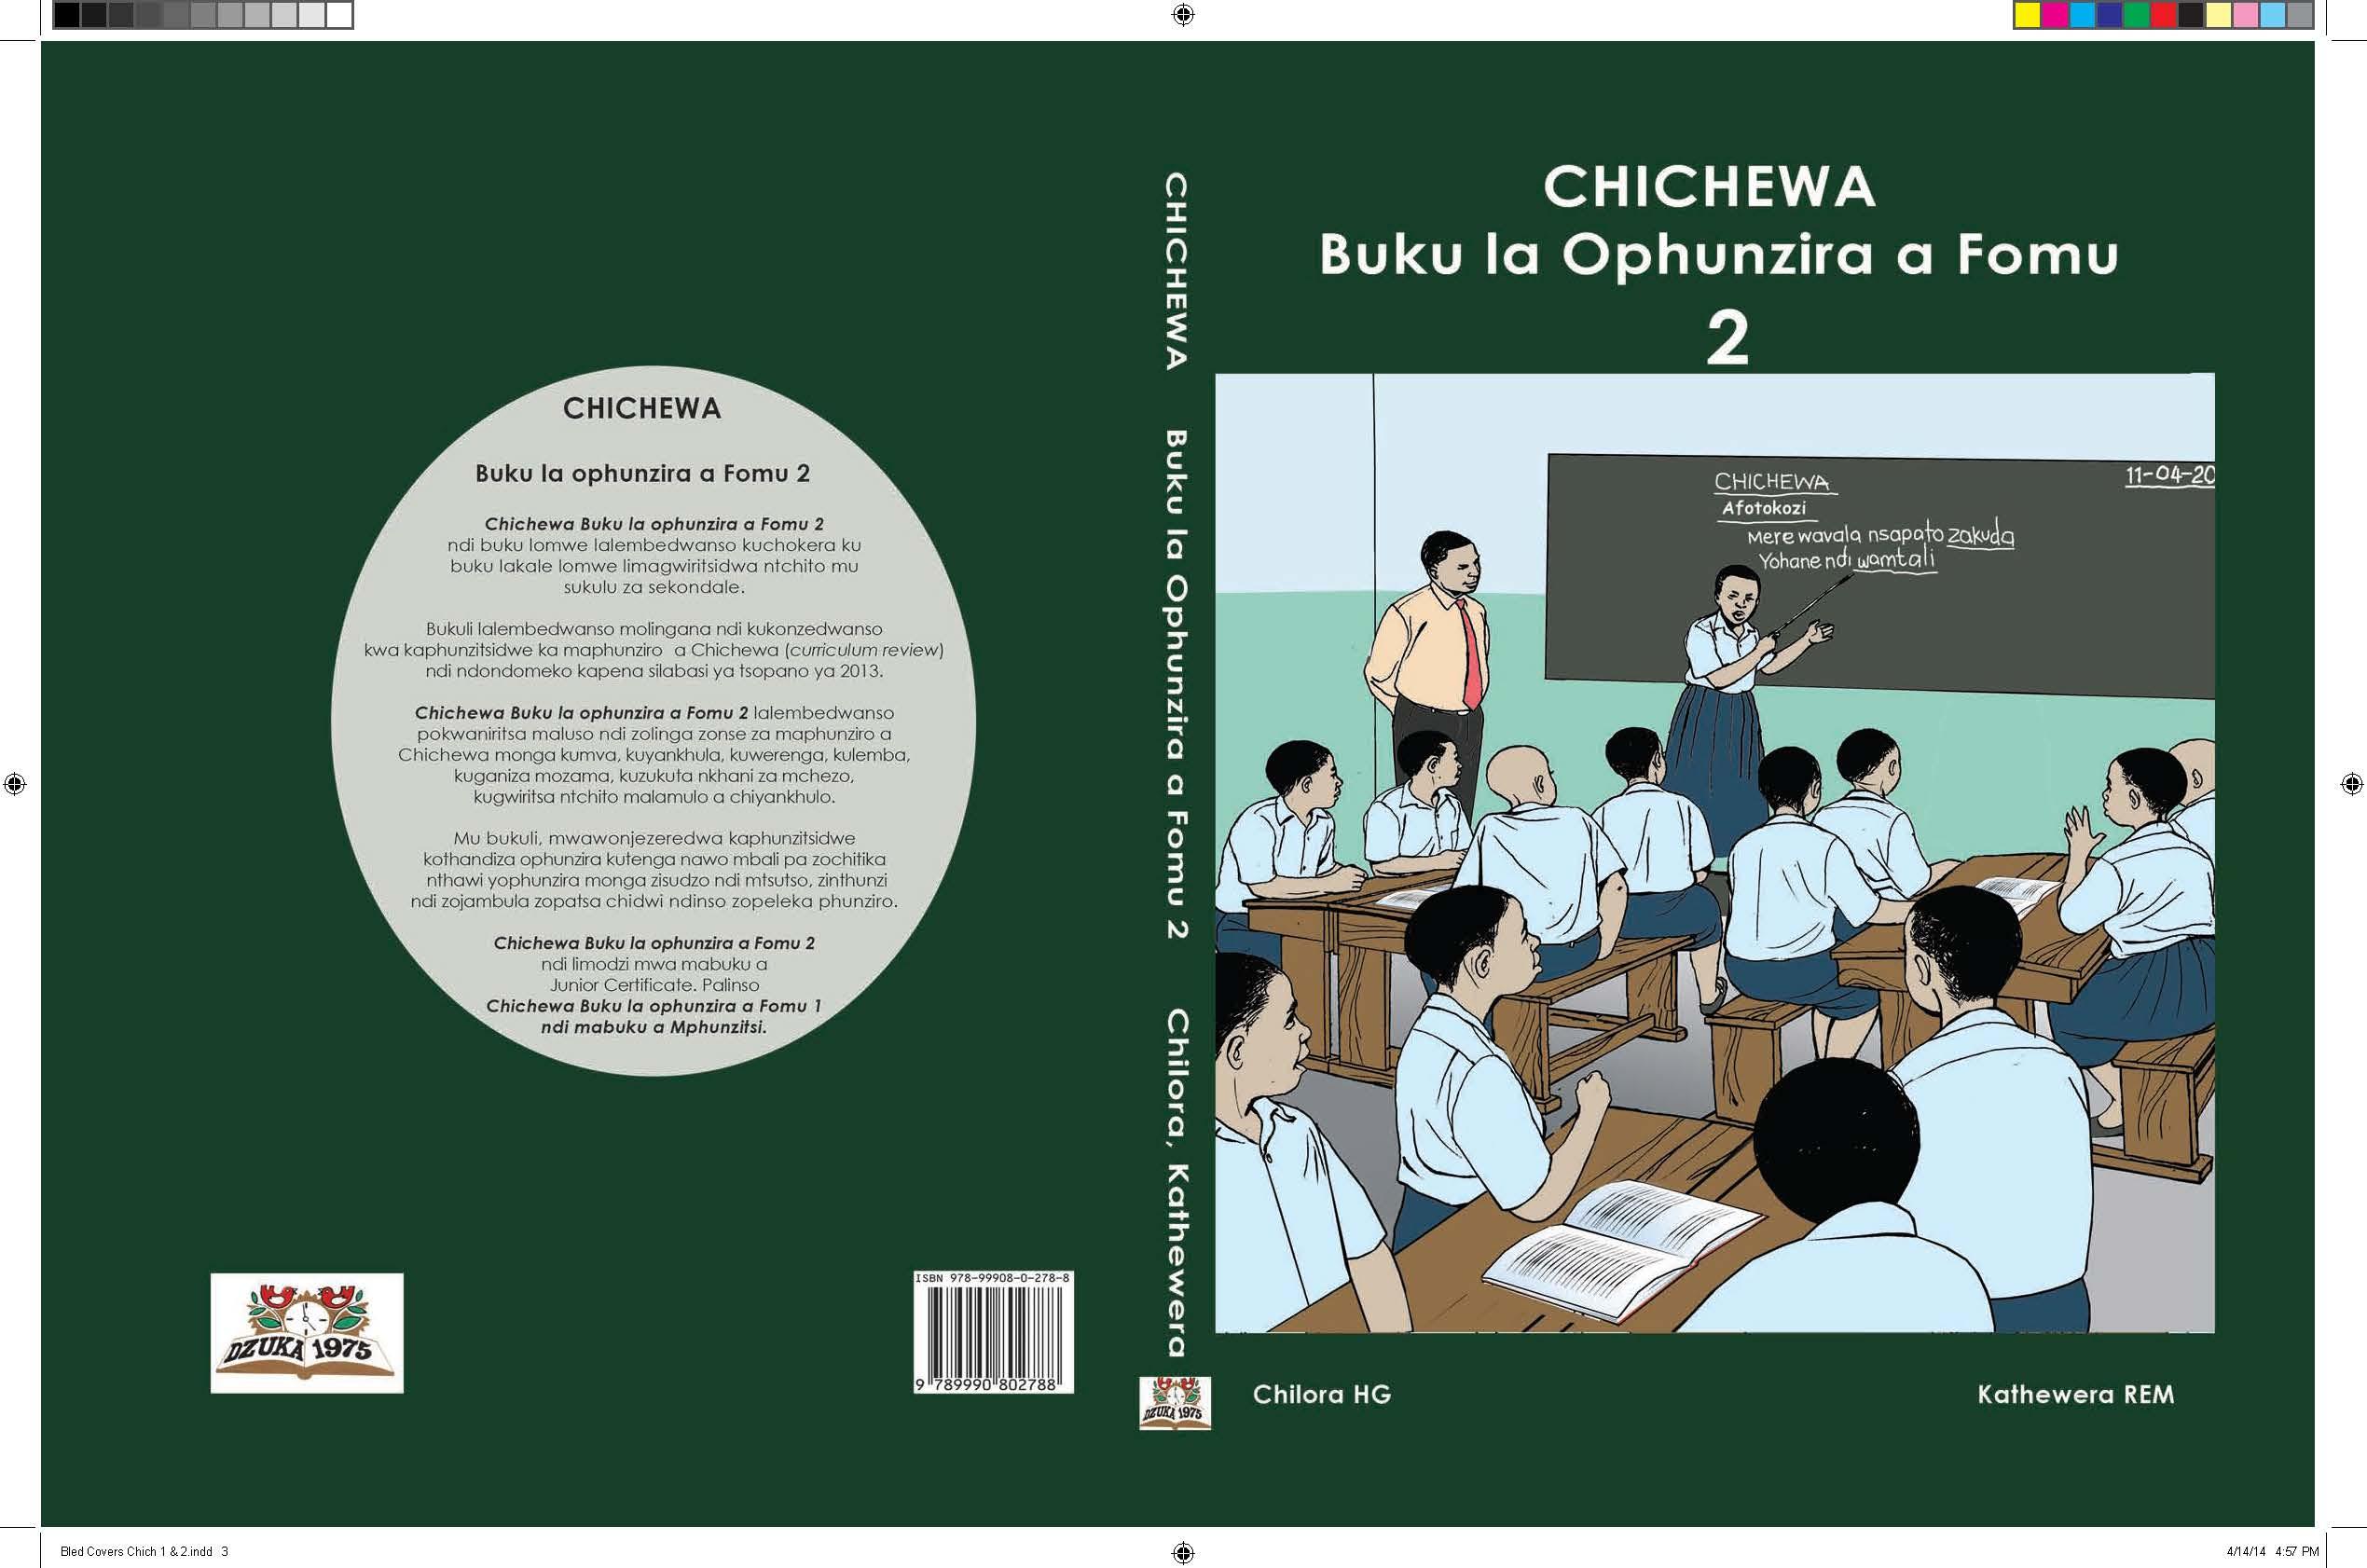 Chich-2-Cover-15-April-version-LOW-RES.p1